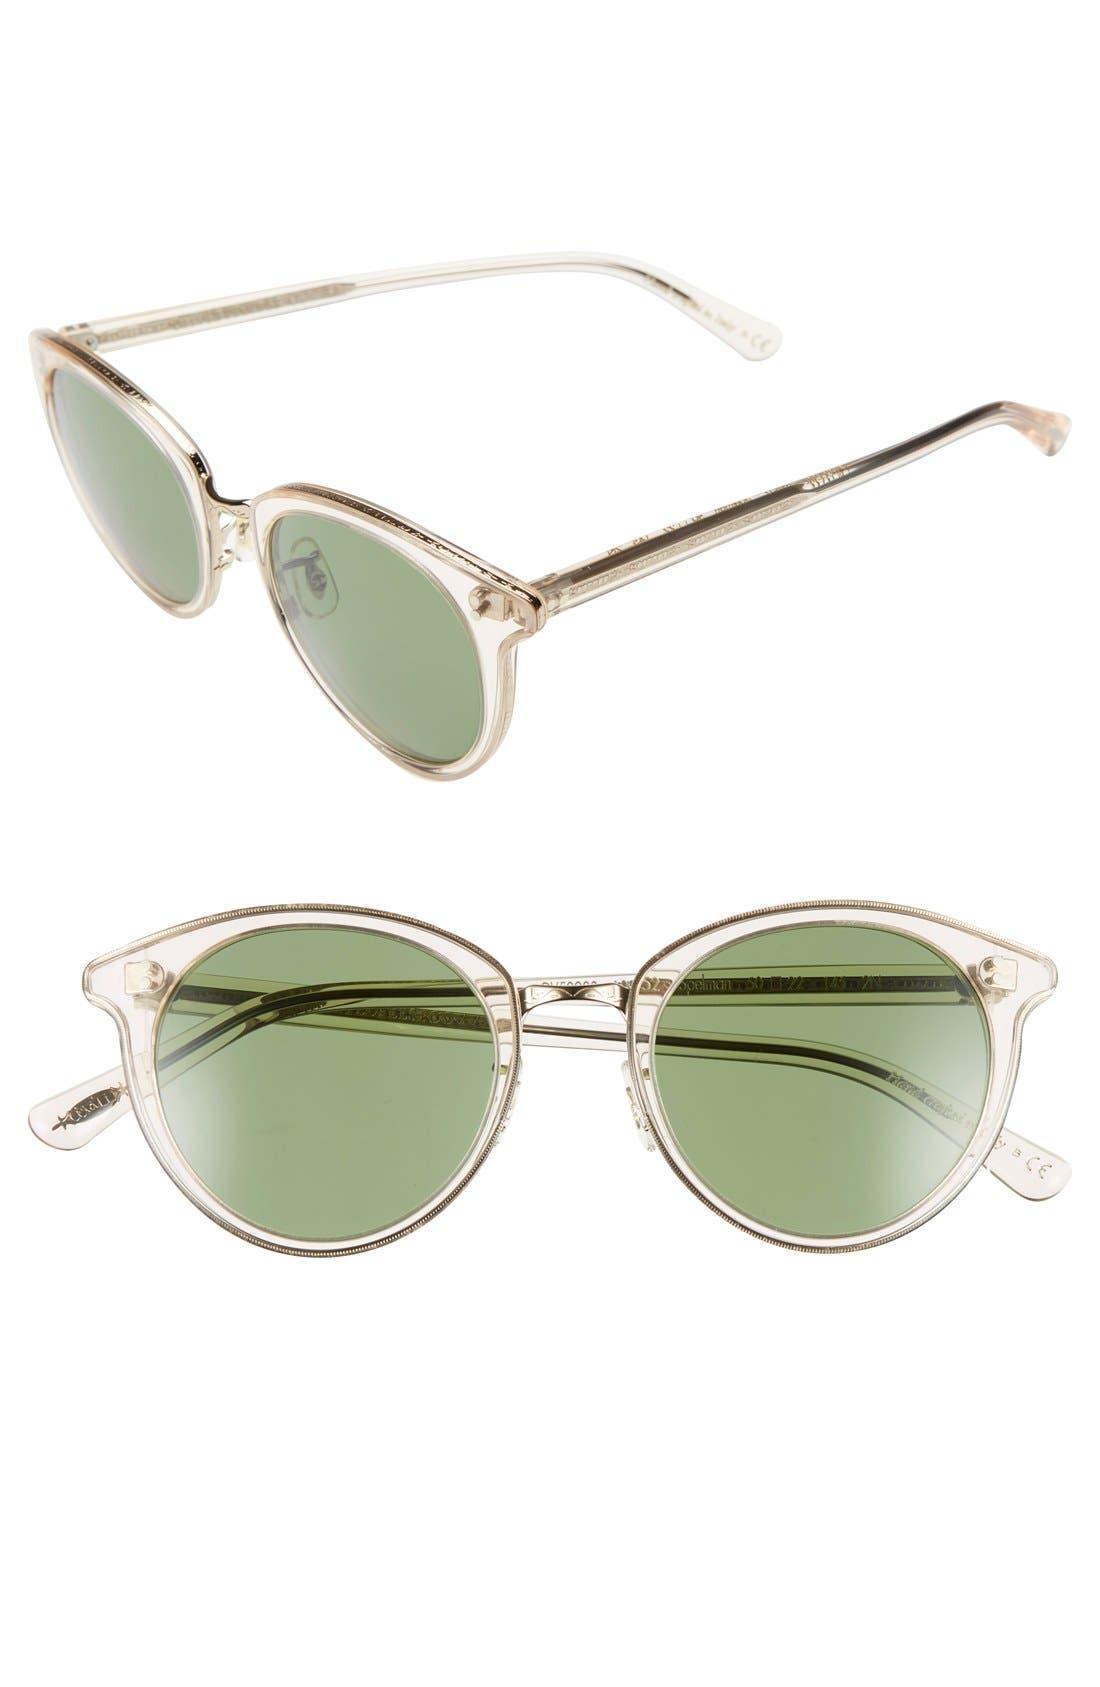 OLIVER PEOPLES Spelman 50mm Retro Sunglasses